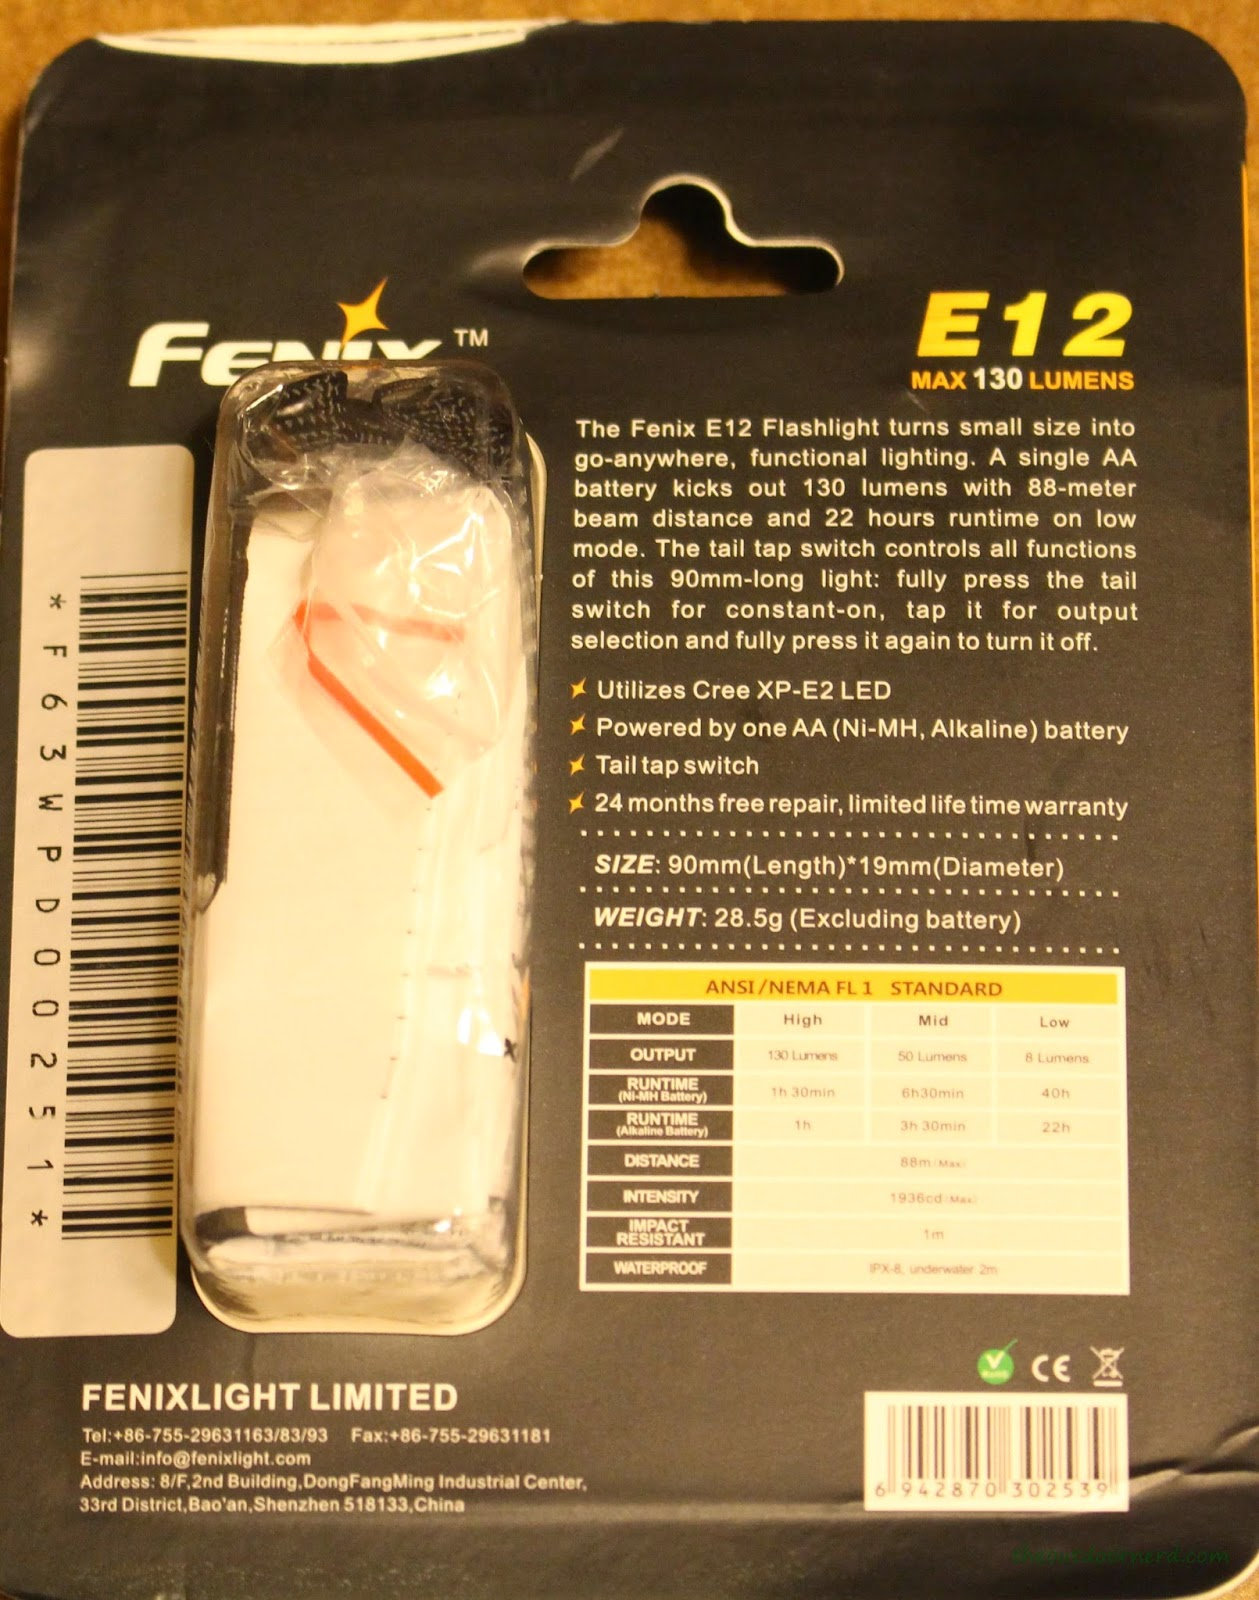 Fenix E12 1xAA EDC Flashlight Packaging 3